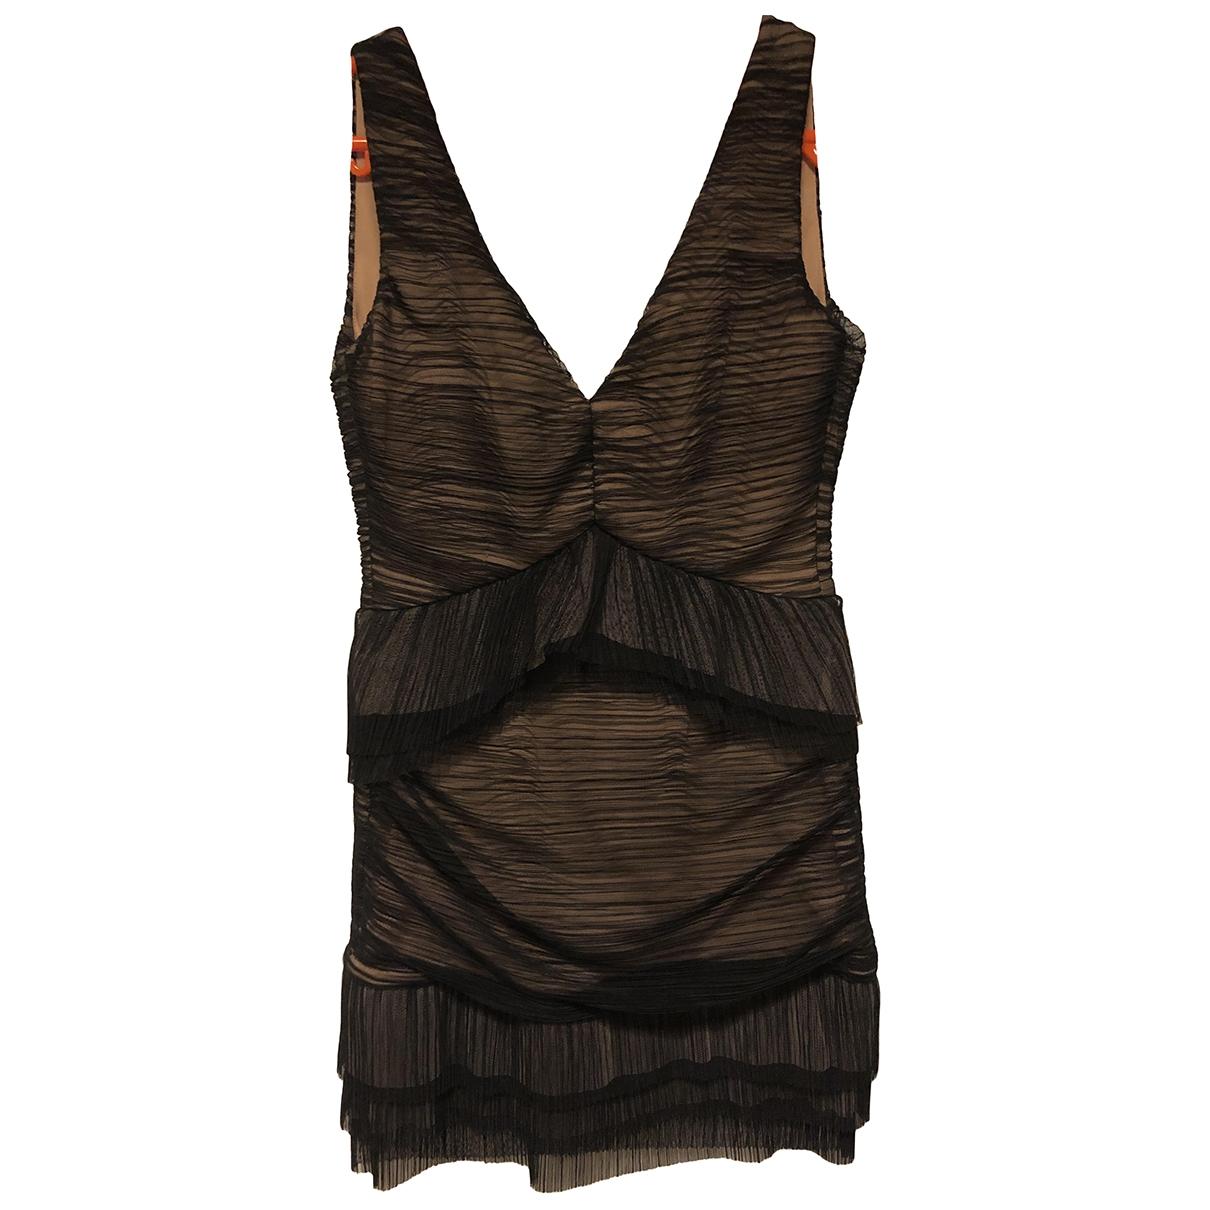 Bcbg Max Azria \N Black dress for Women 00 0-5